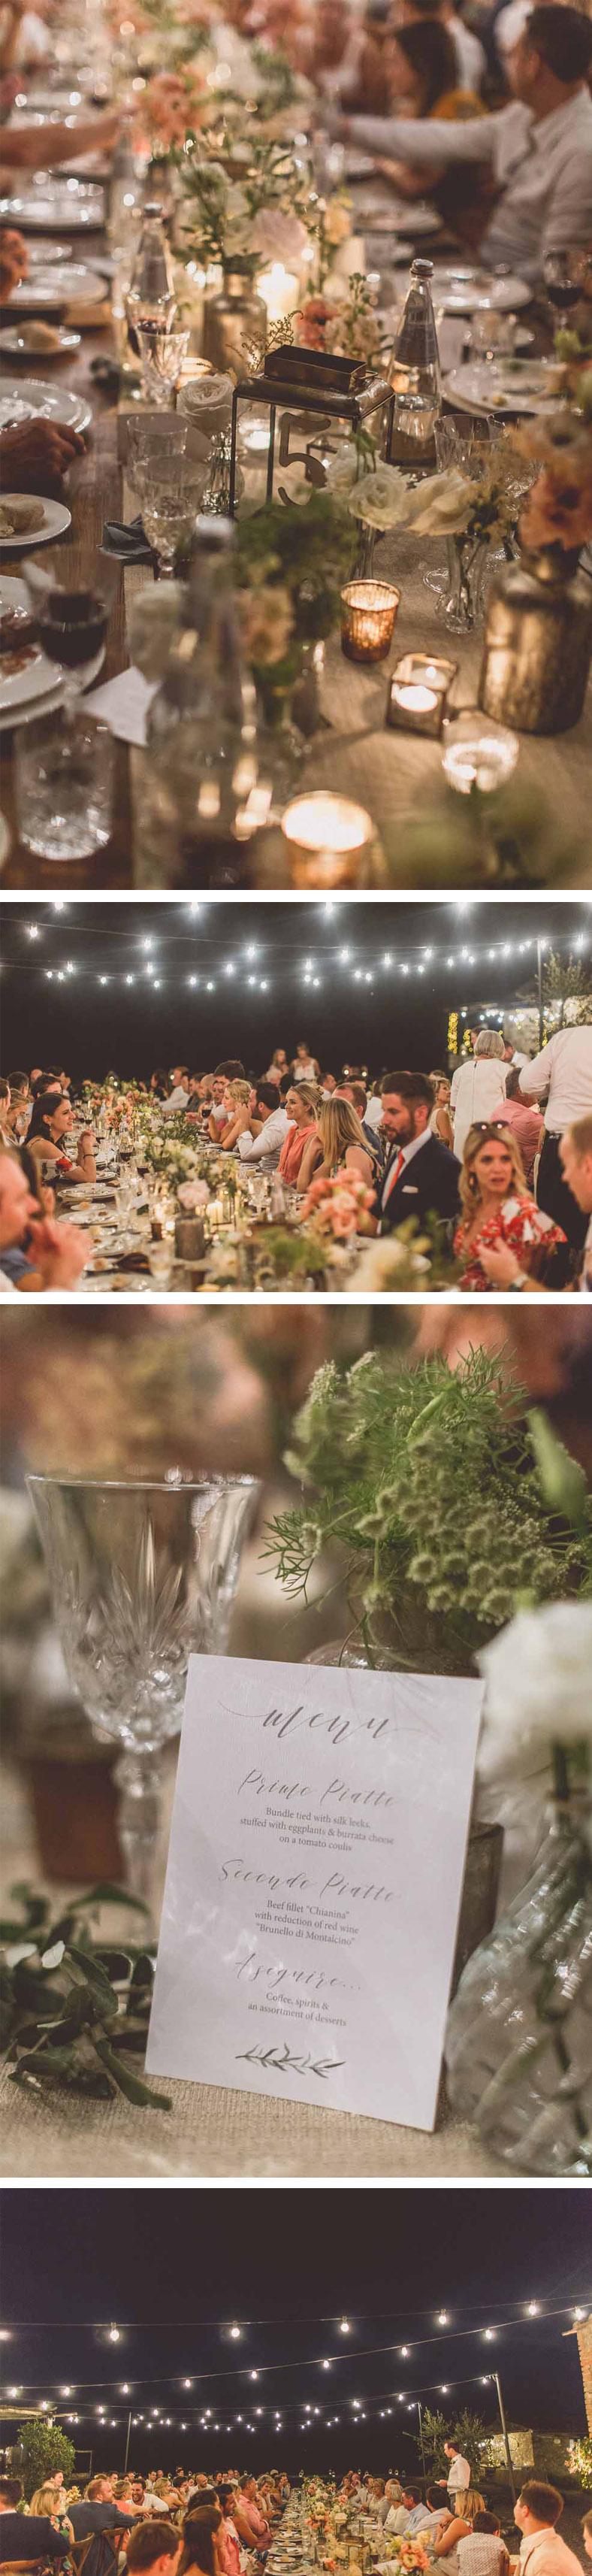 Long wooden wedding tables festoon lighting dark Tuscany Italy style